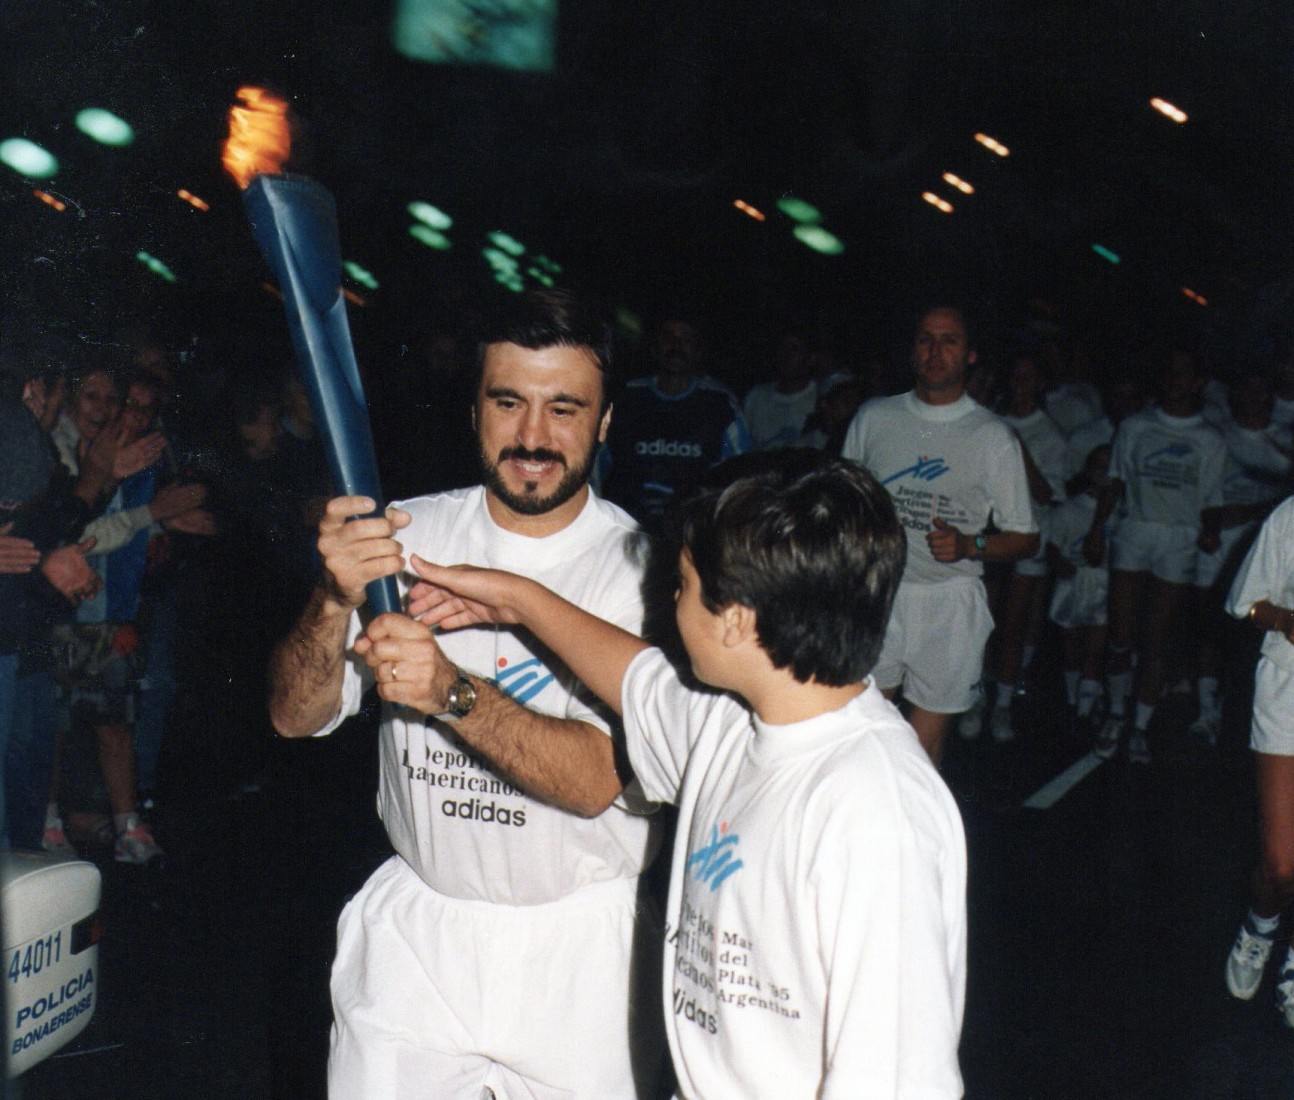 Hace 20 años Jorge Juri (Padre) entrega a Cristian Juri (Hijo) la Antorcha Panamericana.